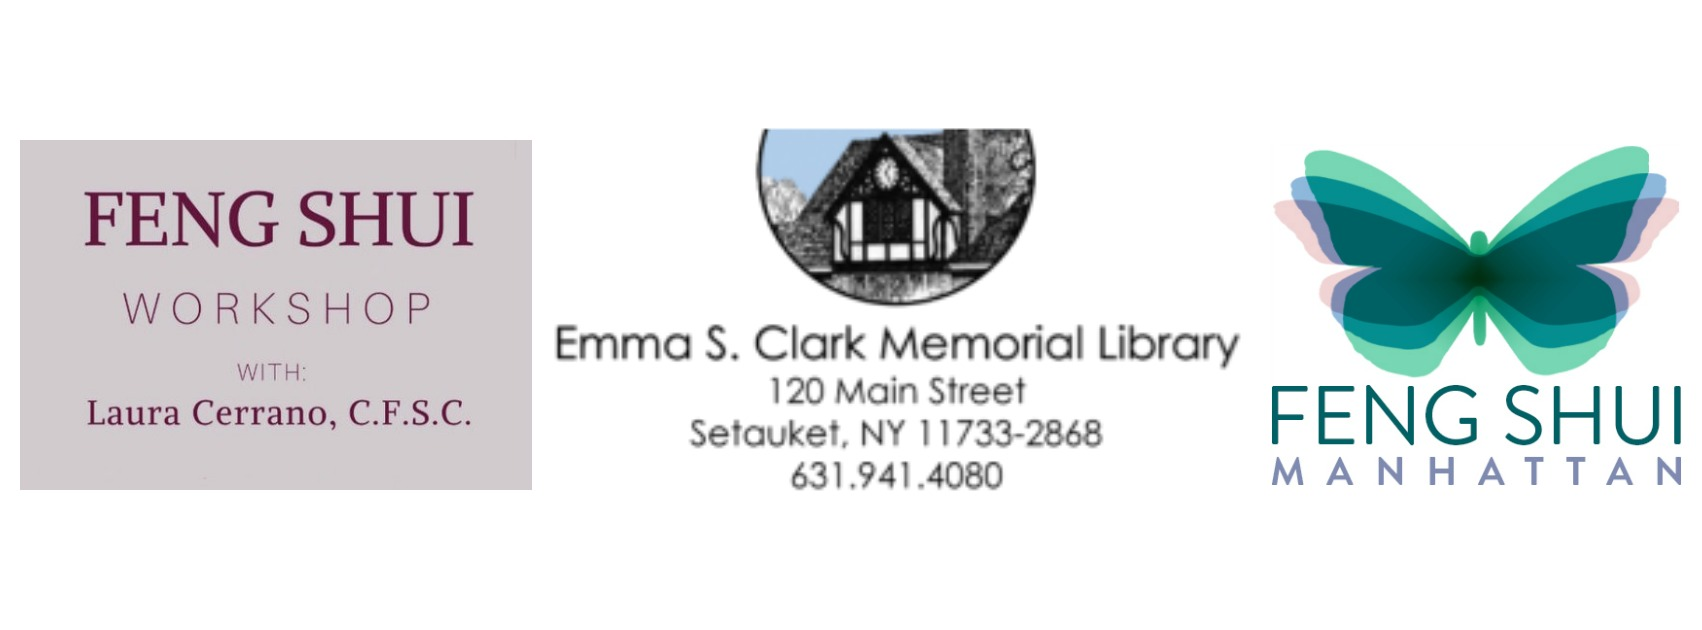 free feng shui workshop at emma s clark memorial libra